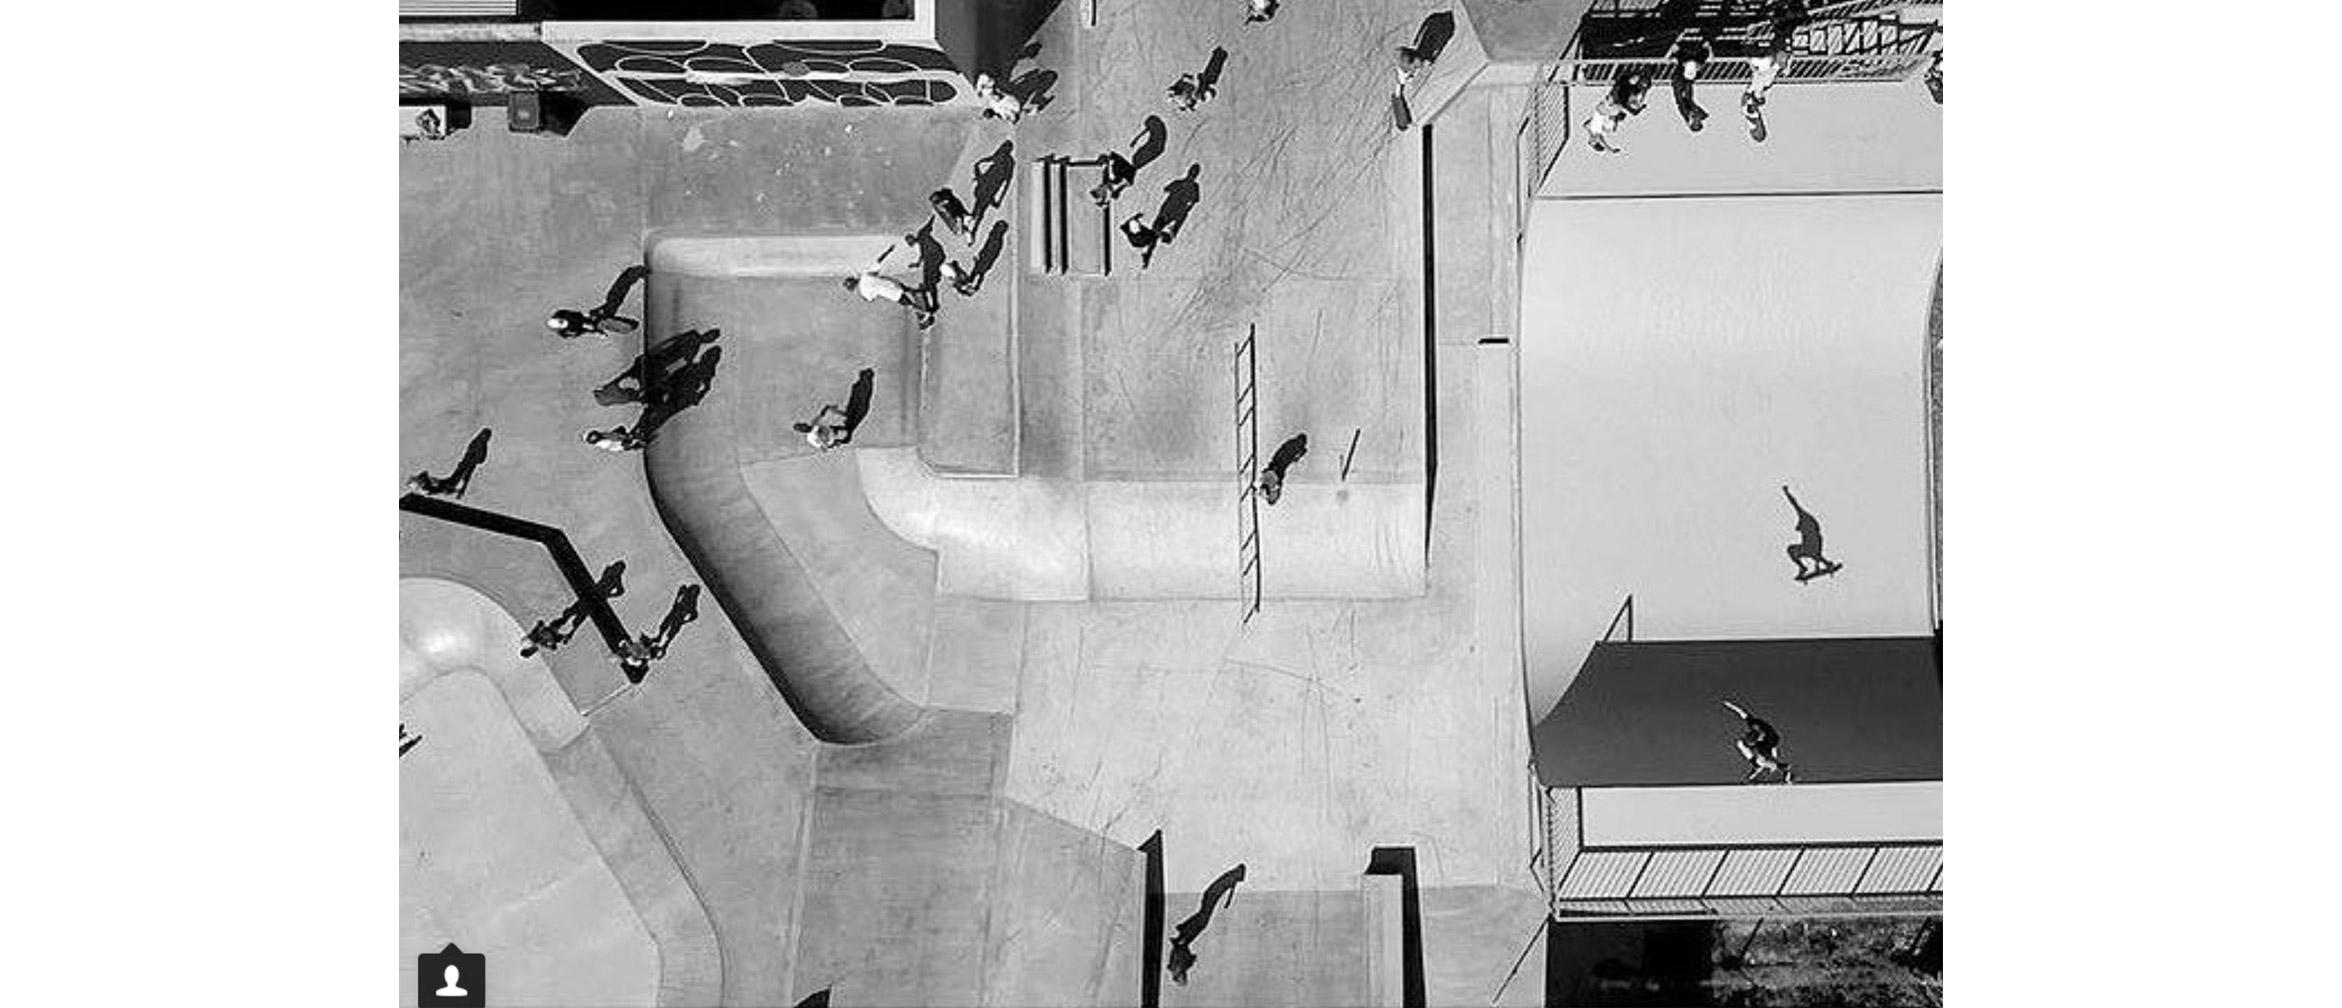 Sunshine Beach skate park opening day birds eye view